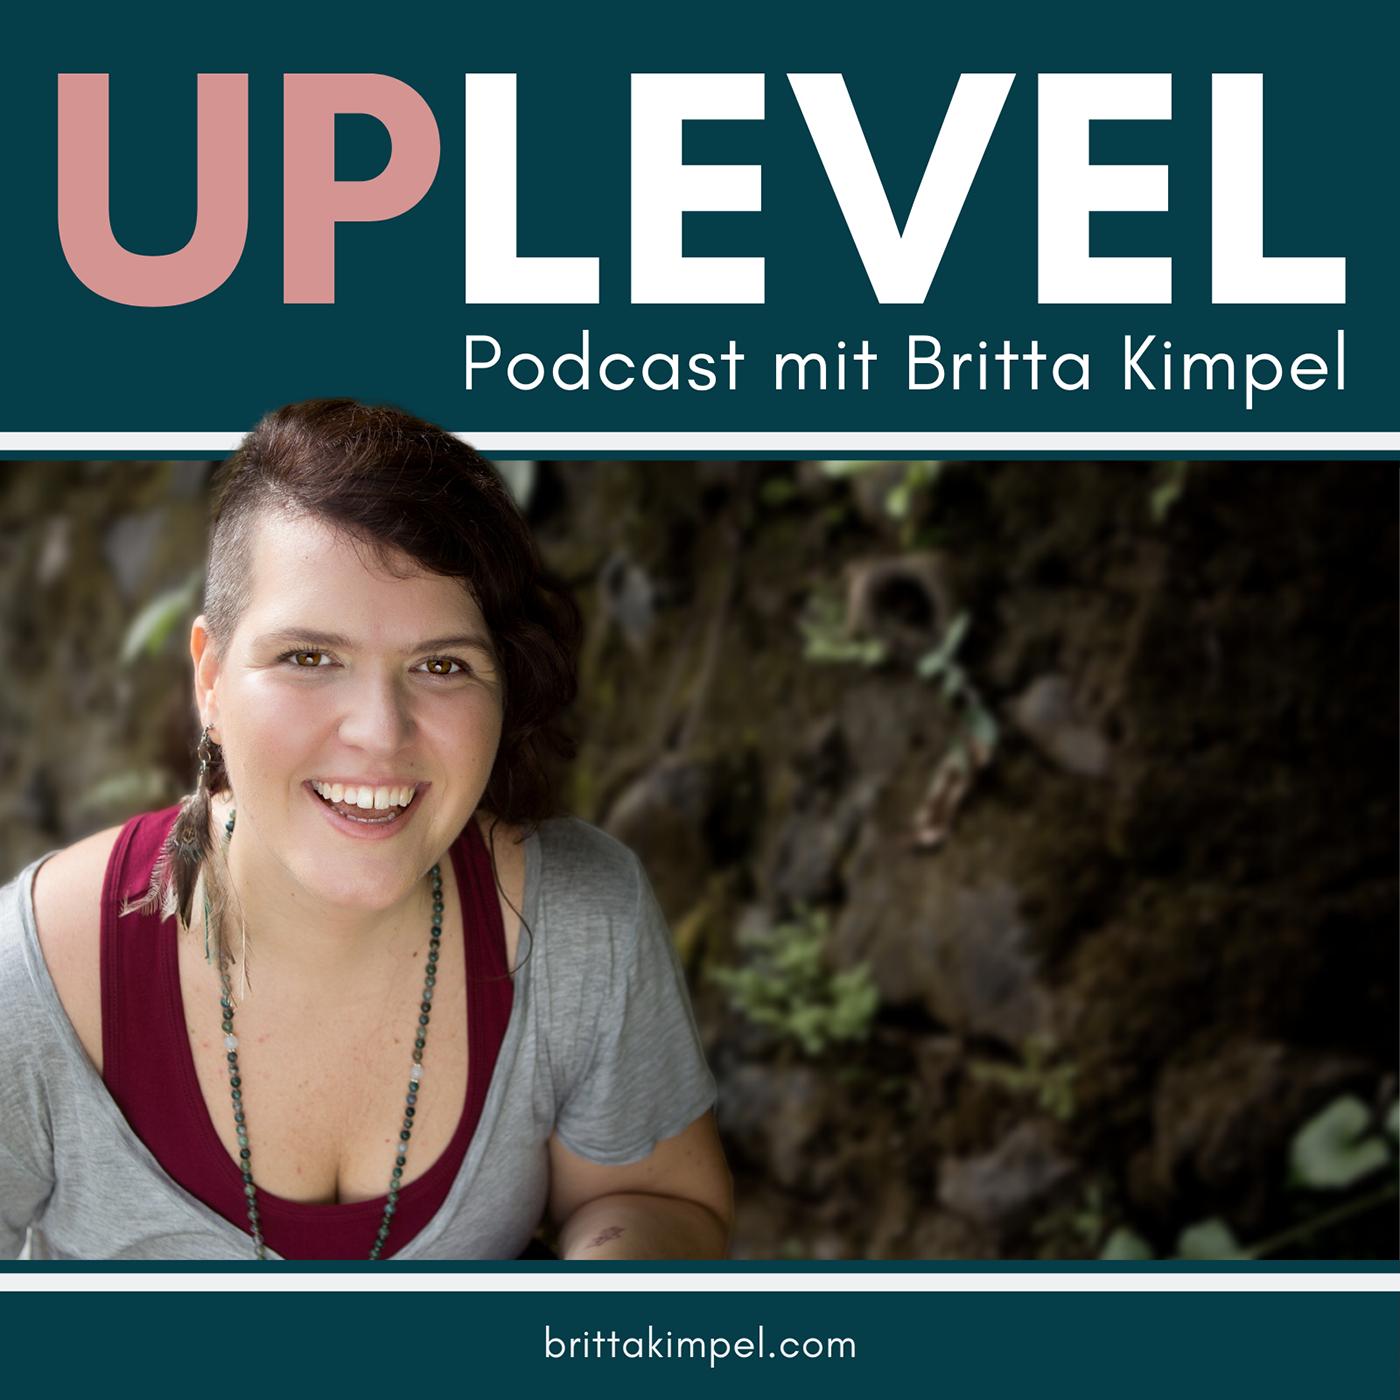 UPLEVEL Podcast show art